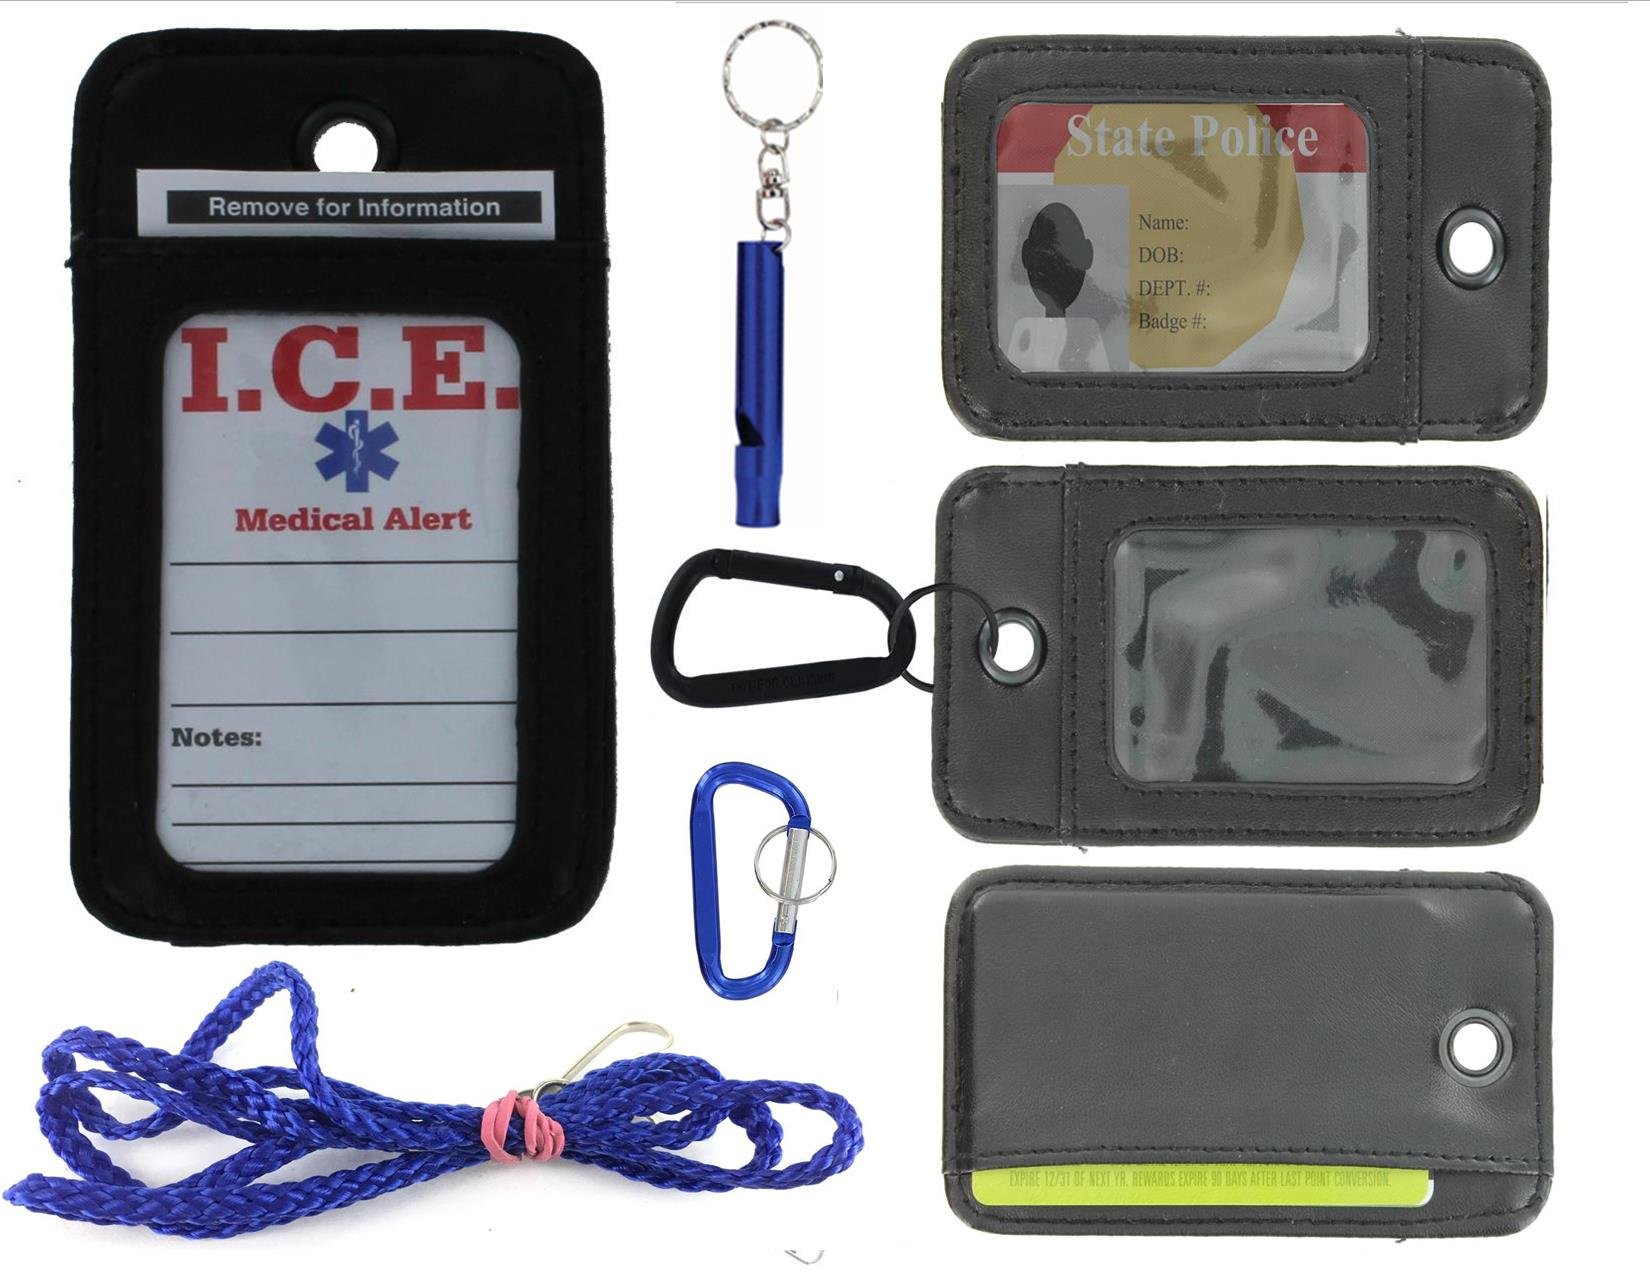 EDOG I.C.E. Lost Child & Medical Alert Parent Locator Neck Wallet   Lanyard   Key Chain   Carabiner   I.C.E. Cards   Leather   Emergency Contacts   Medical   Allergy   Meds   Language (BLUE LANYARD)